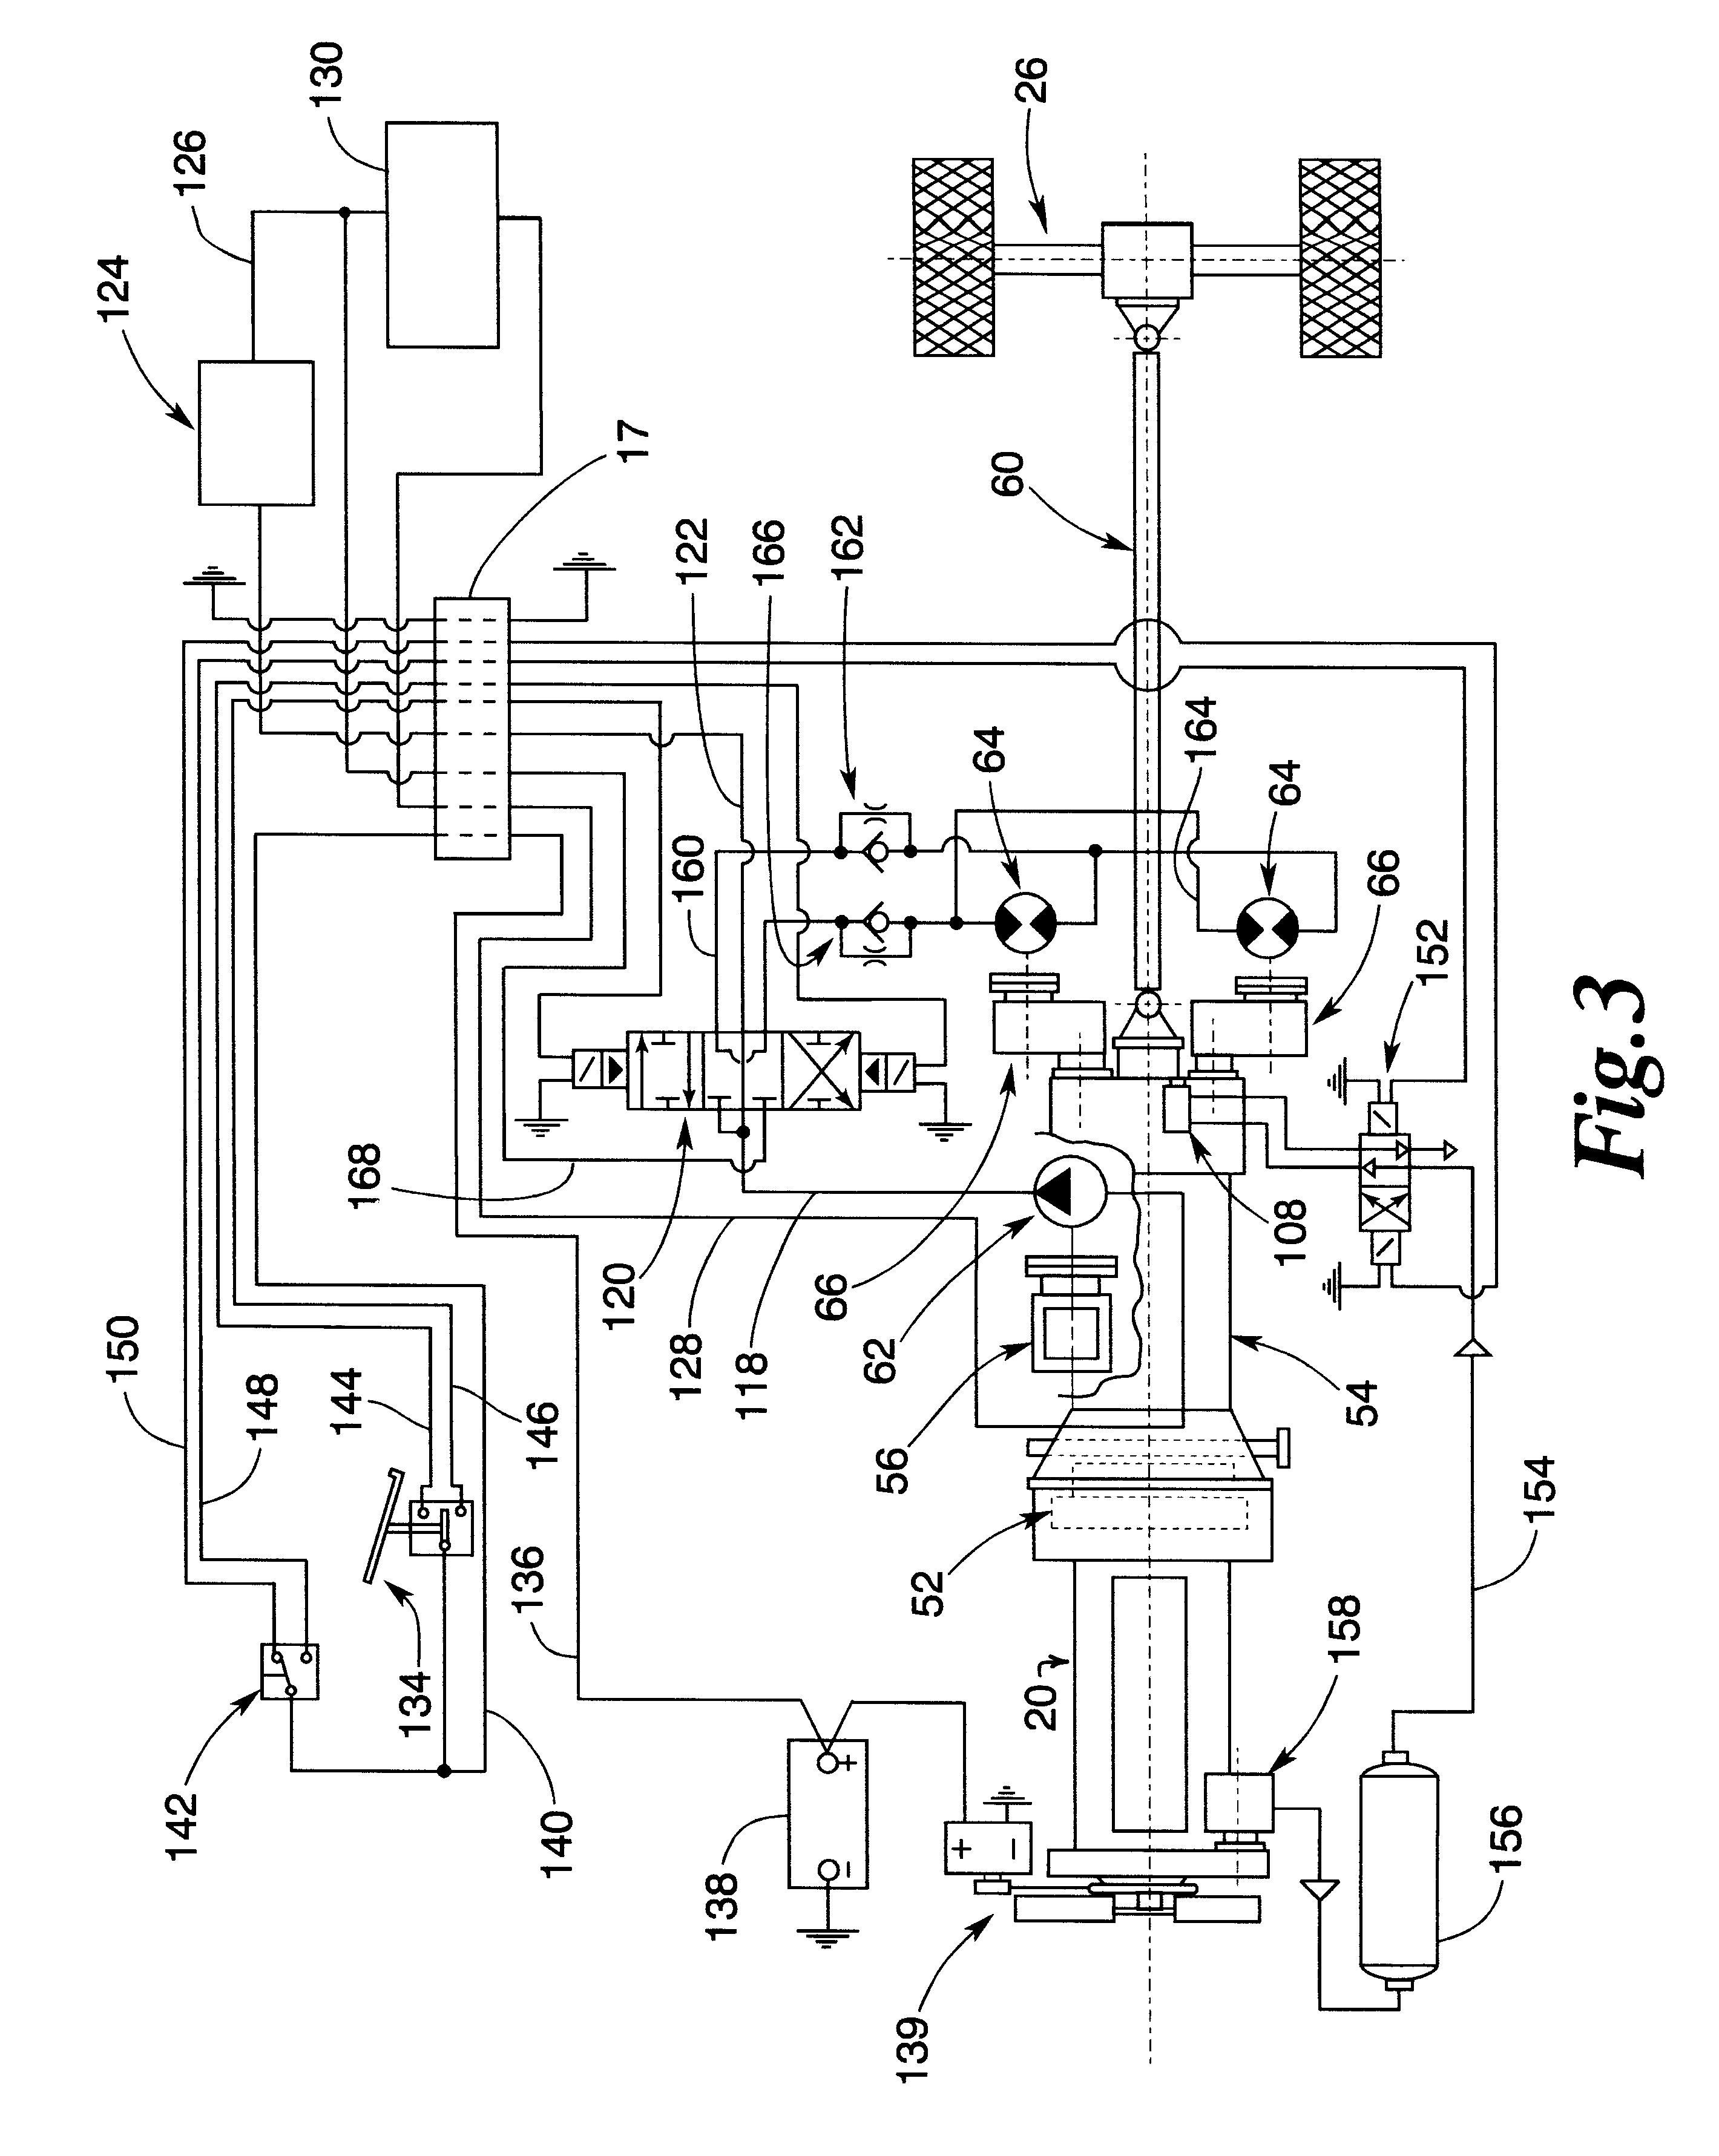 Scania Truck Wiring Diagram Abs For Spal 30102120 Alternator Digital